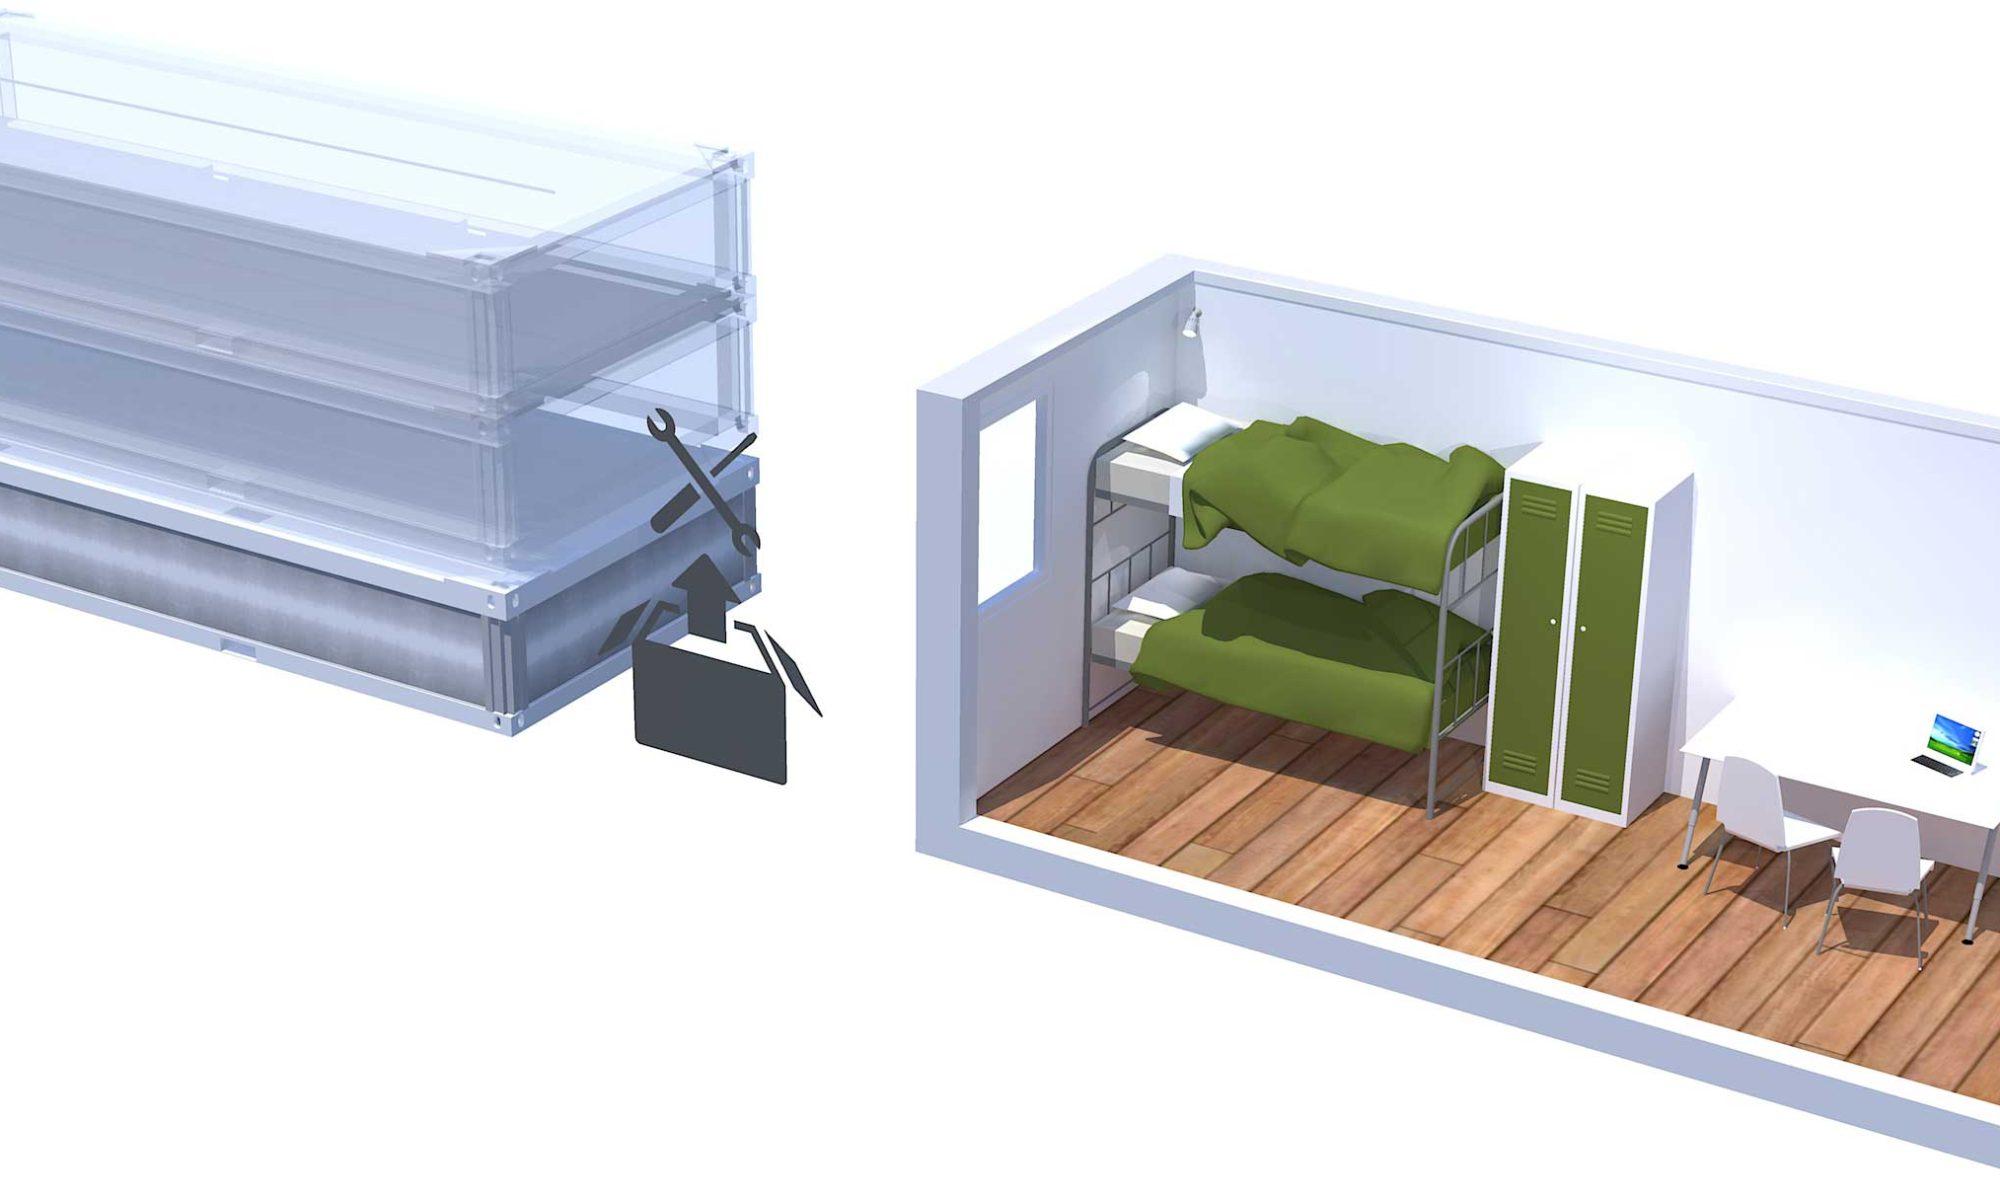 FP 15 flat pack modular home